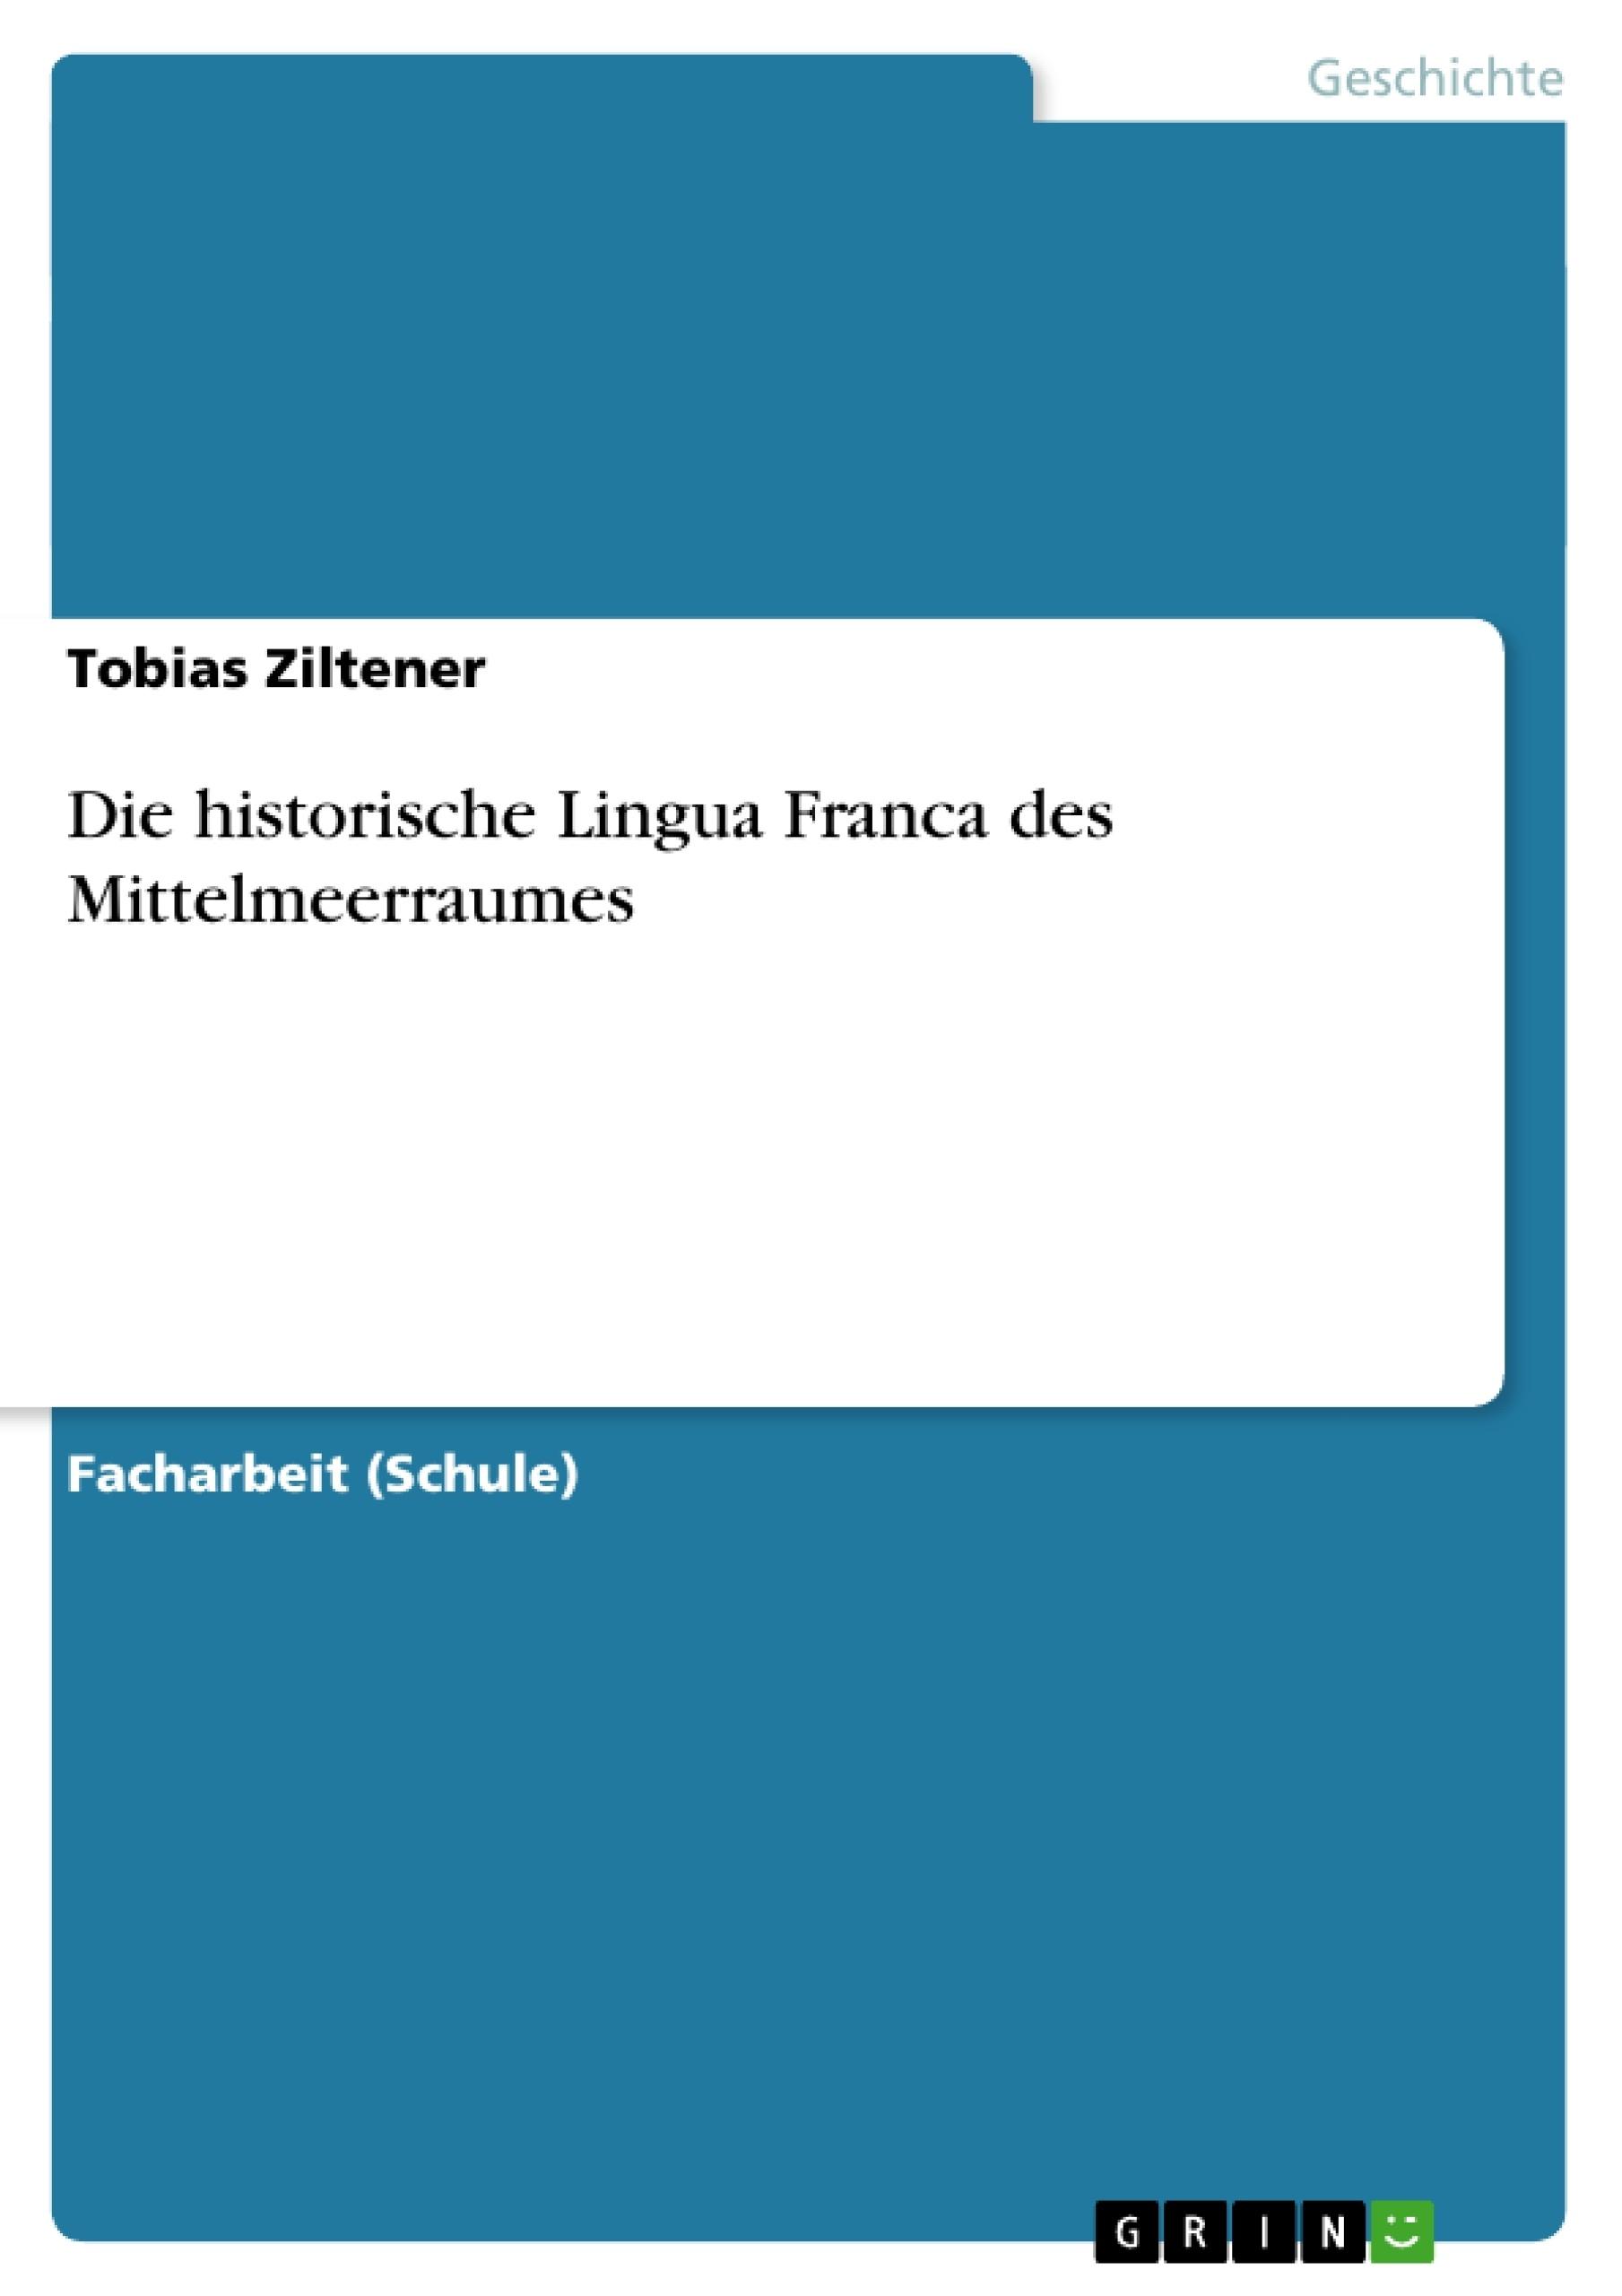 Titel: Die historische Lingua Franca des Mittelmeerraumes